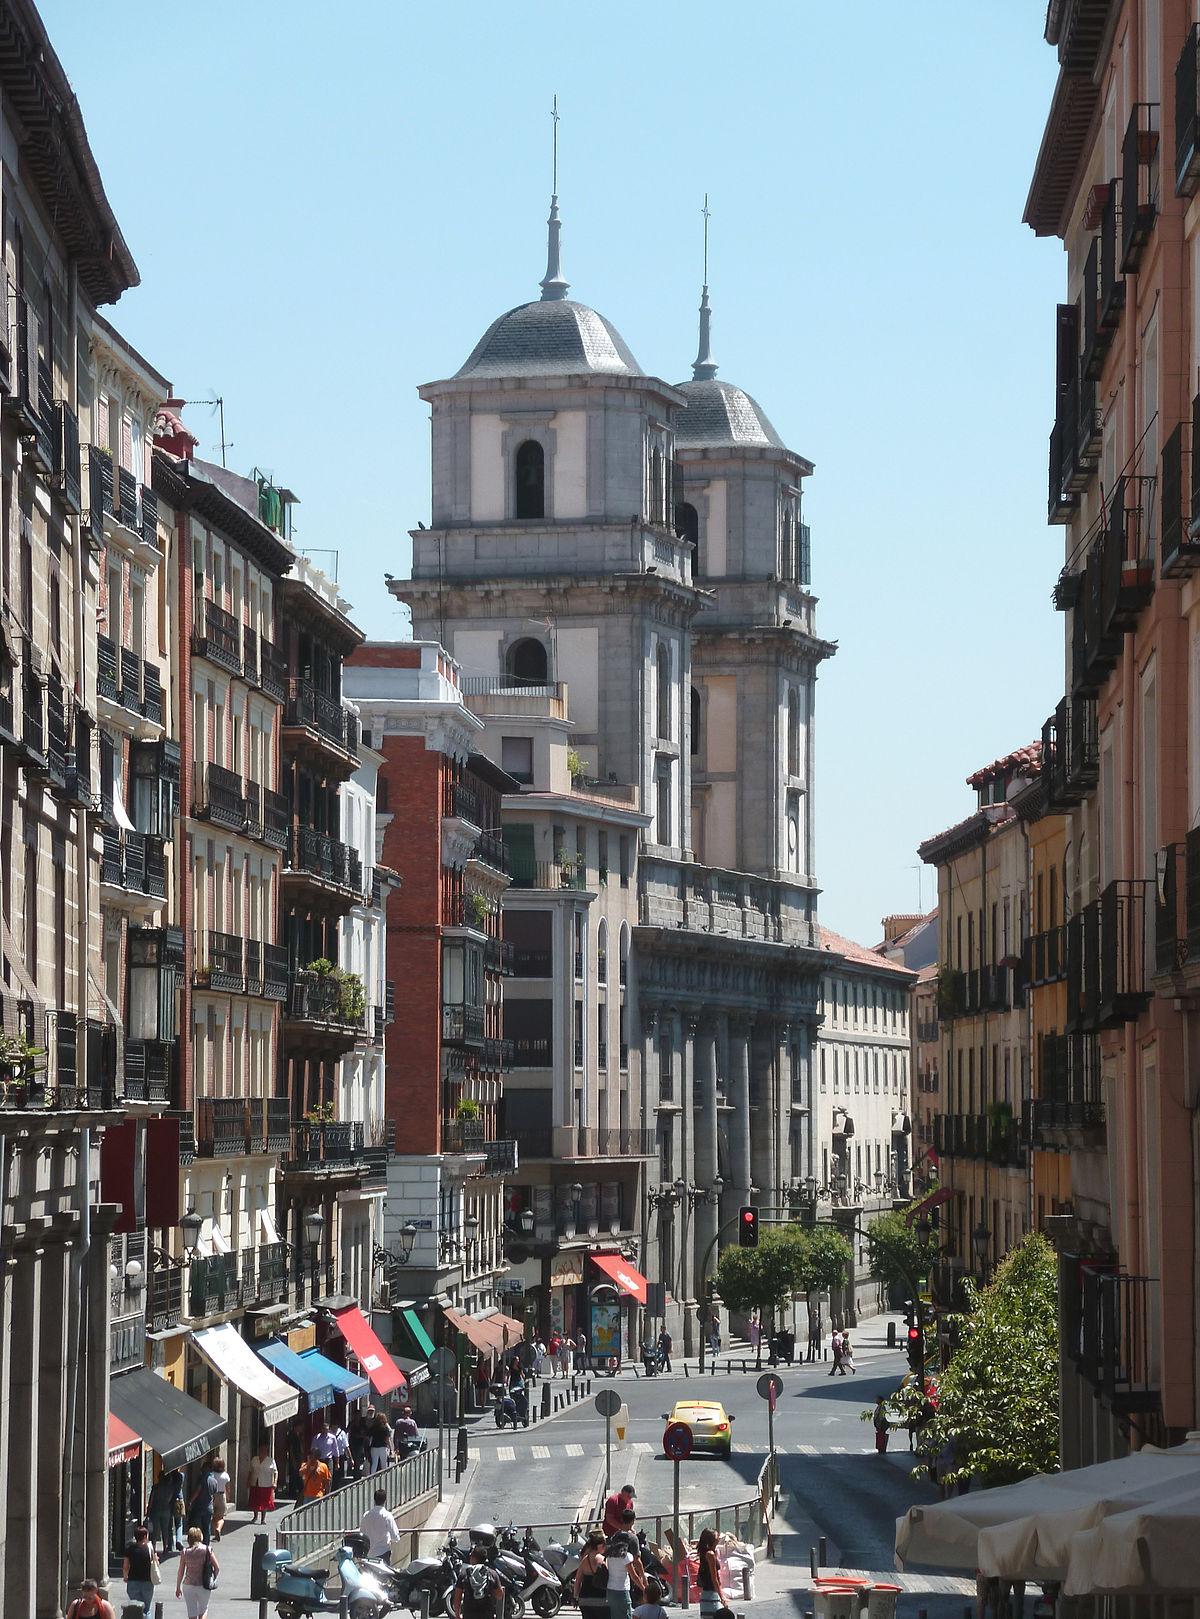 Calle de toledo wikipedia la enciclopedia libre for Calle del prado 9 madrid espana